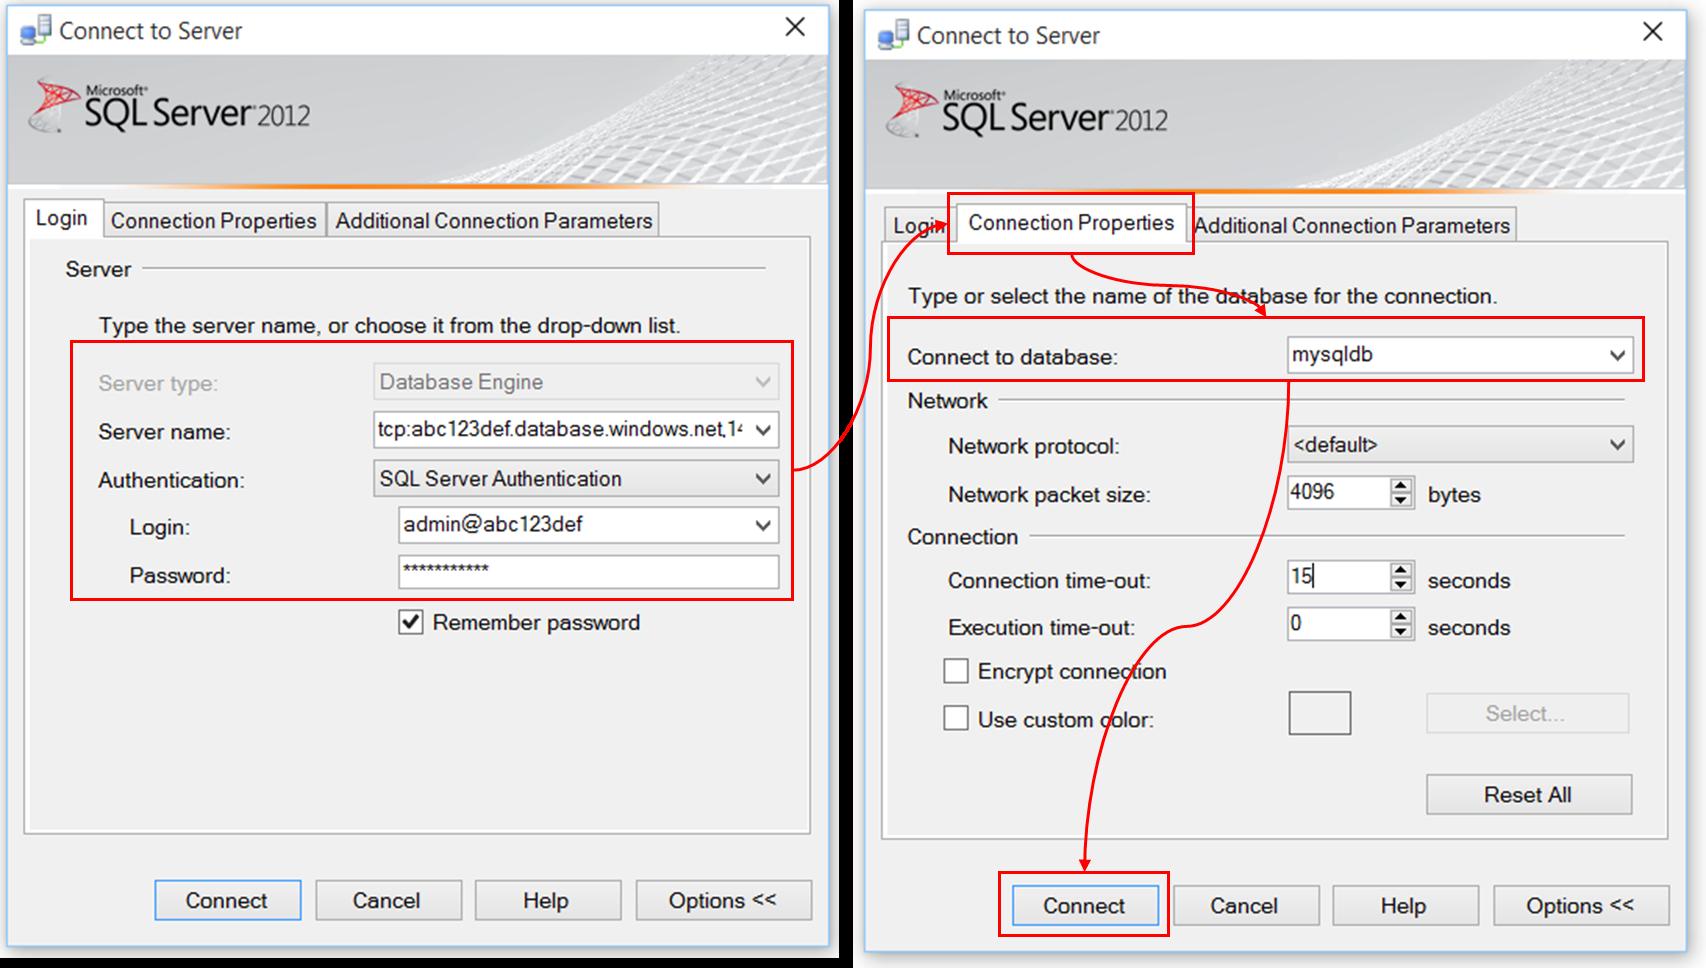 Exporter Vers Sql Partir D Application Insights Microsoft Docs